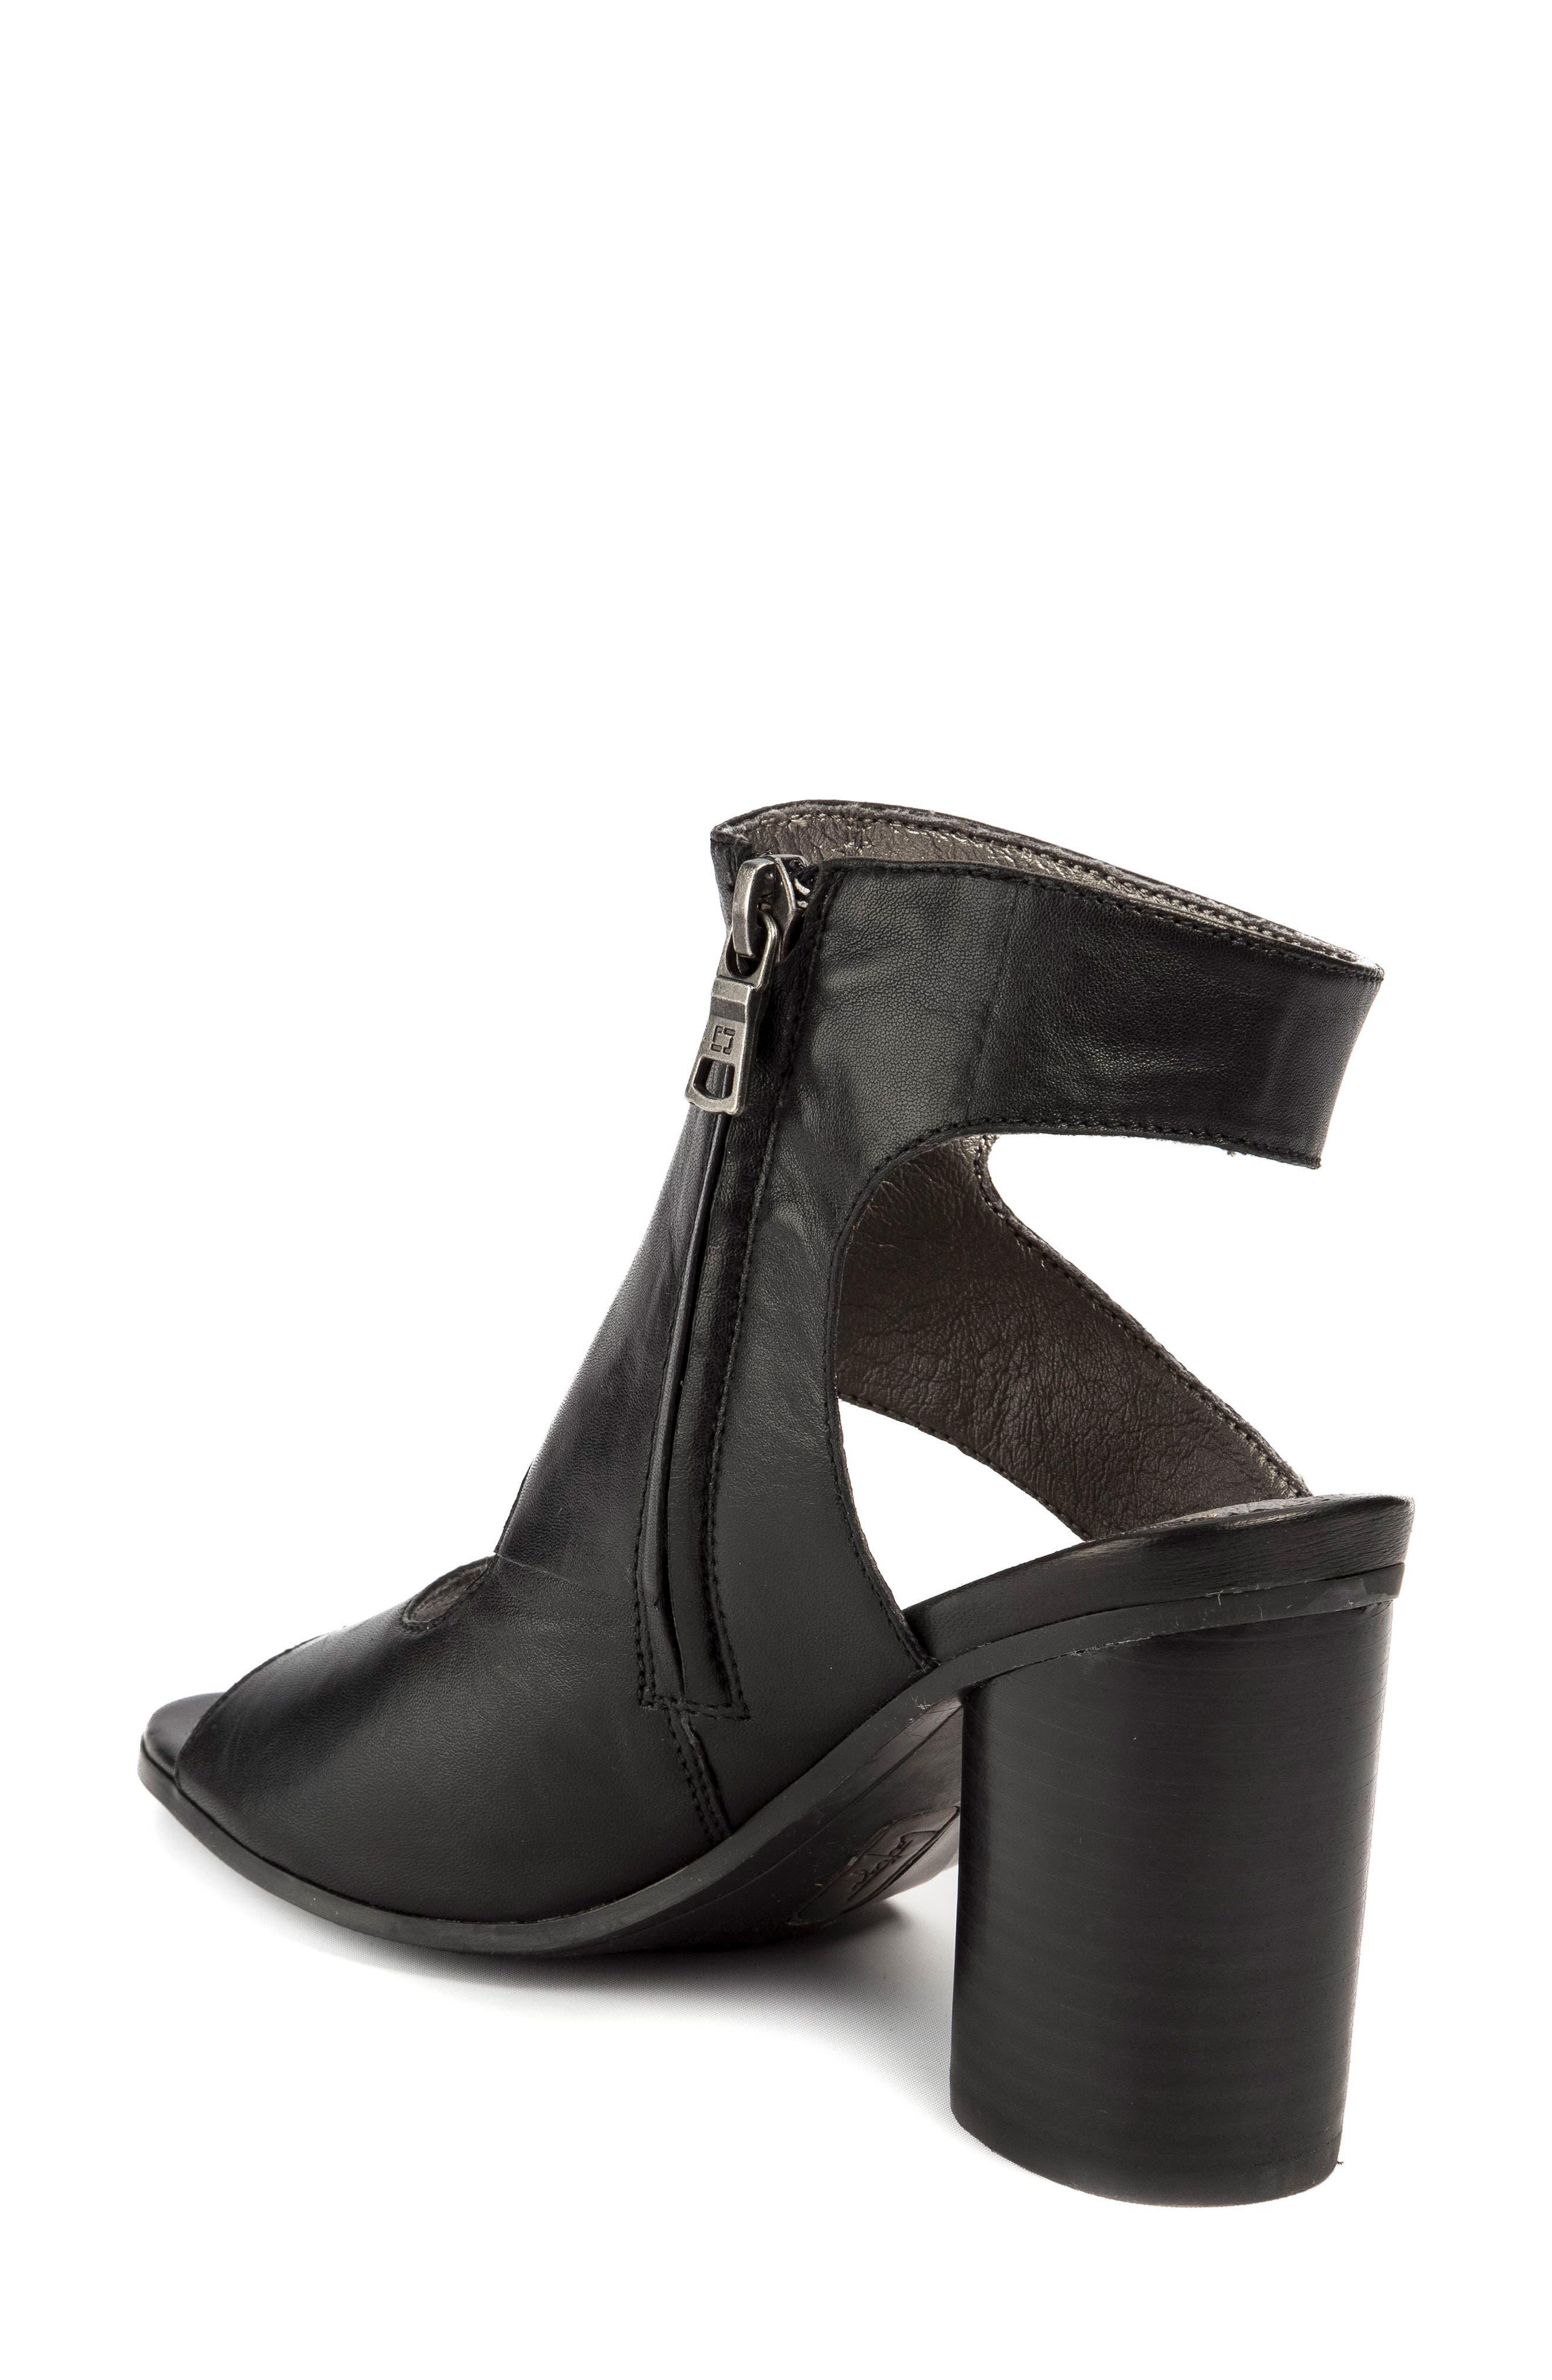 Latigo Hadie Block Heel Sandals 0WKnWXDO1